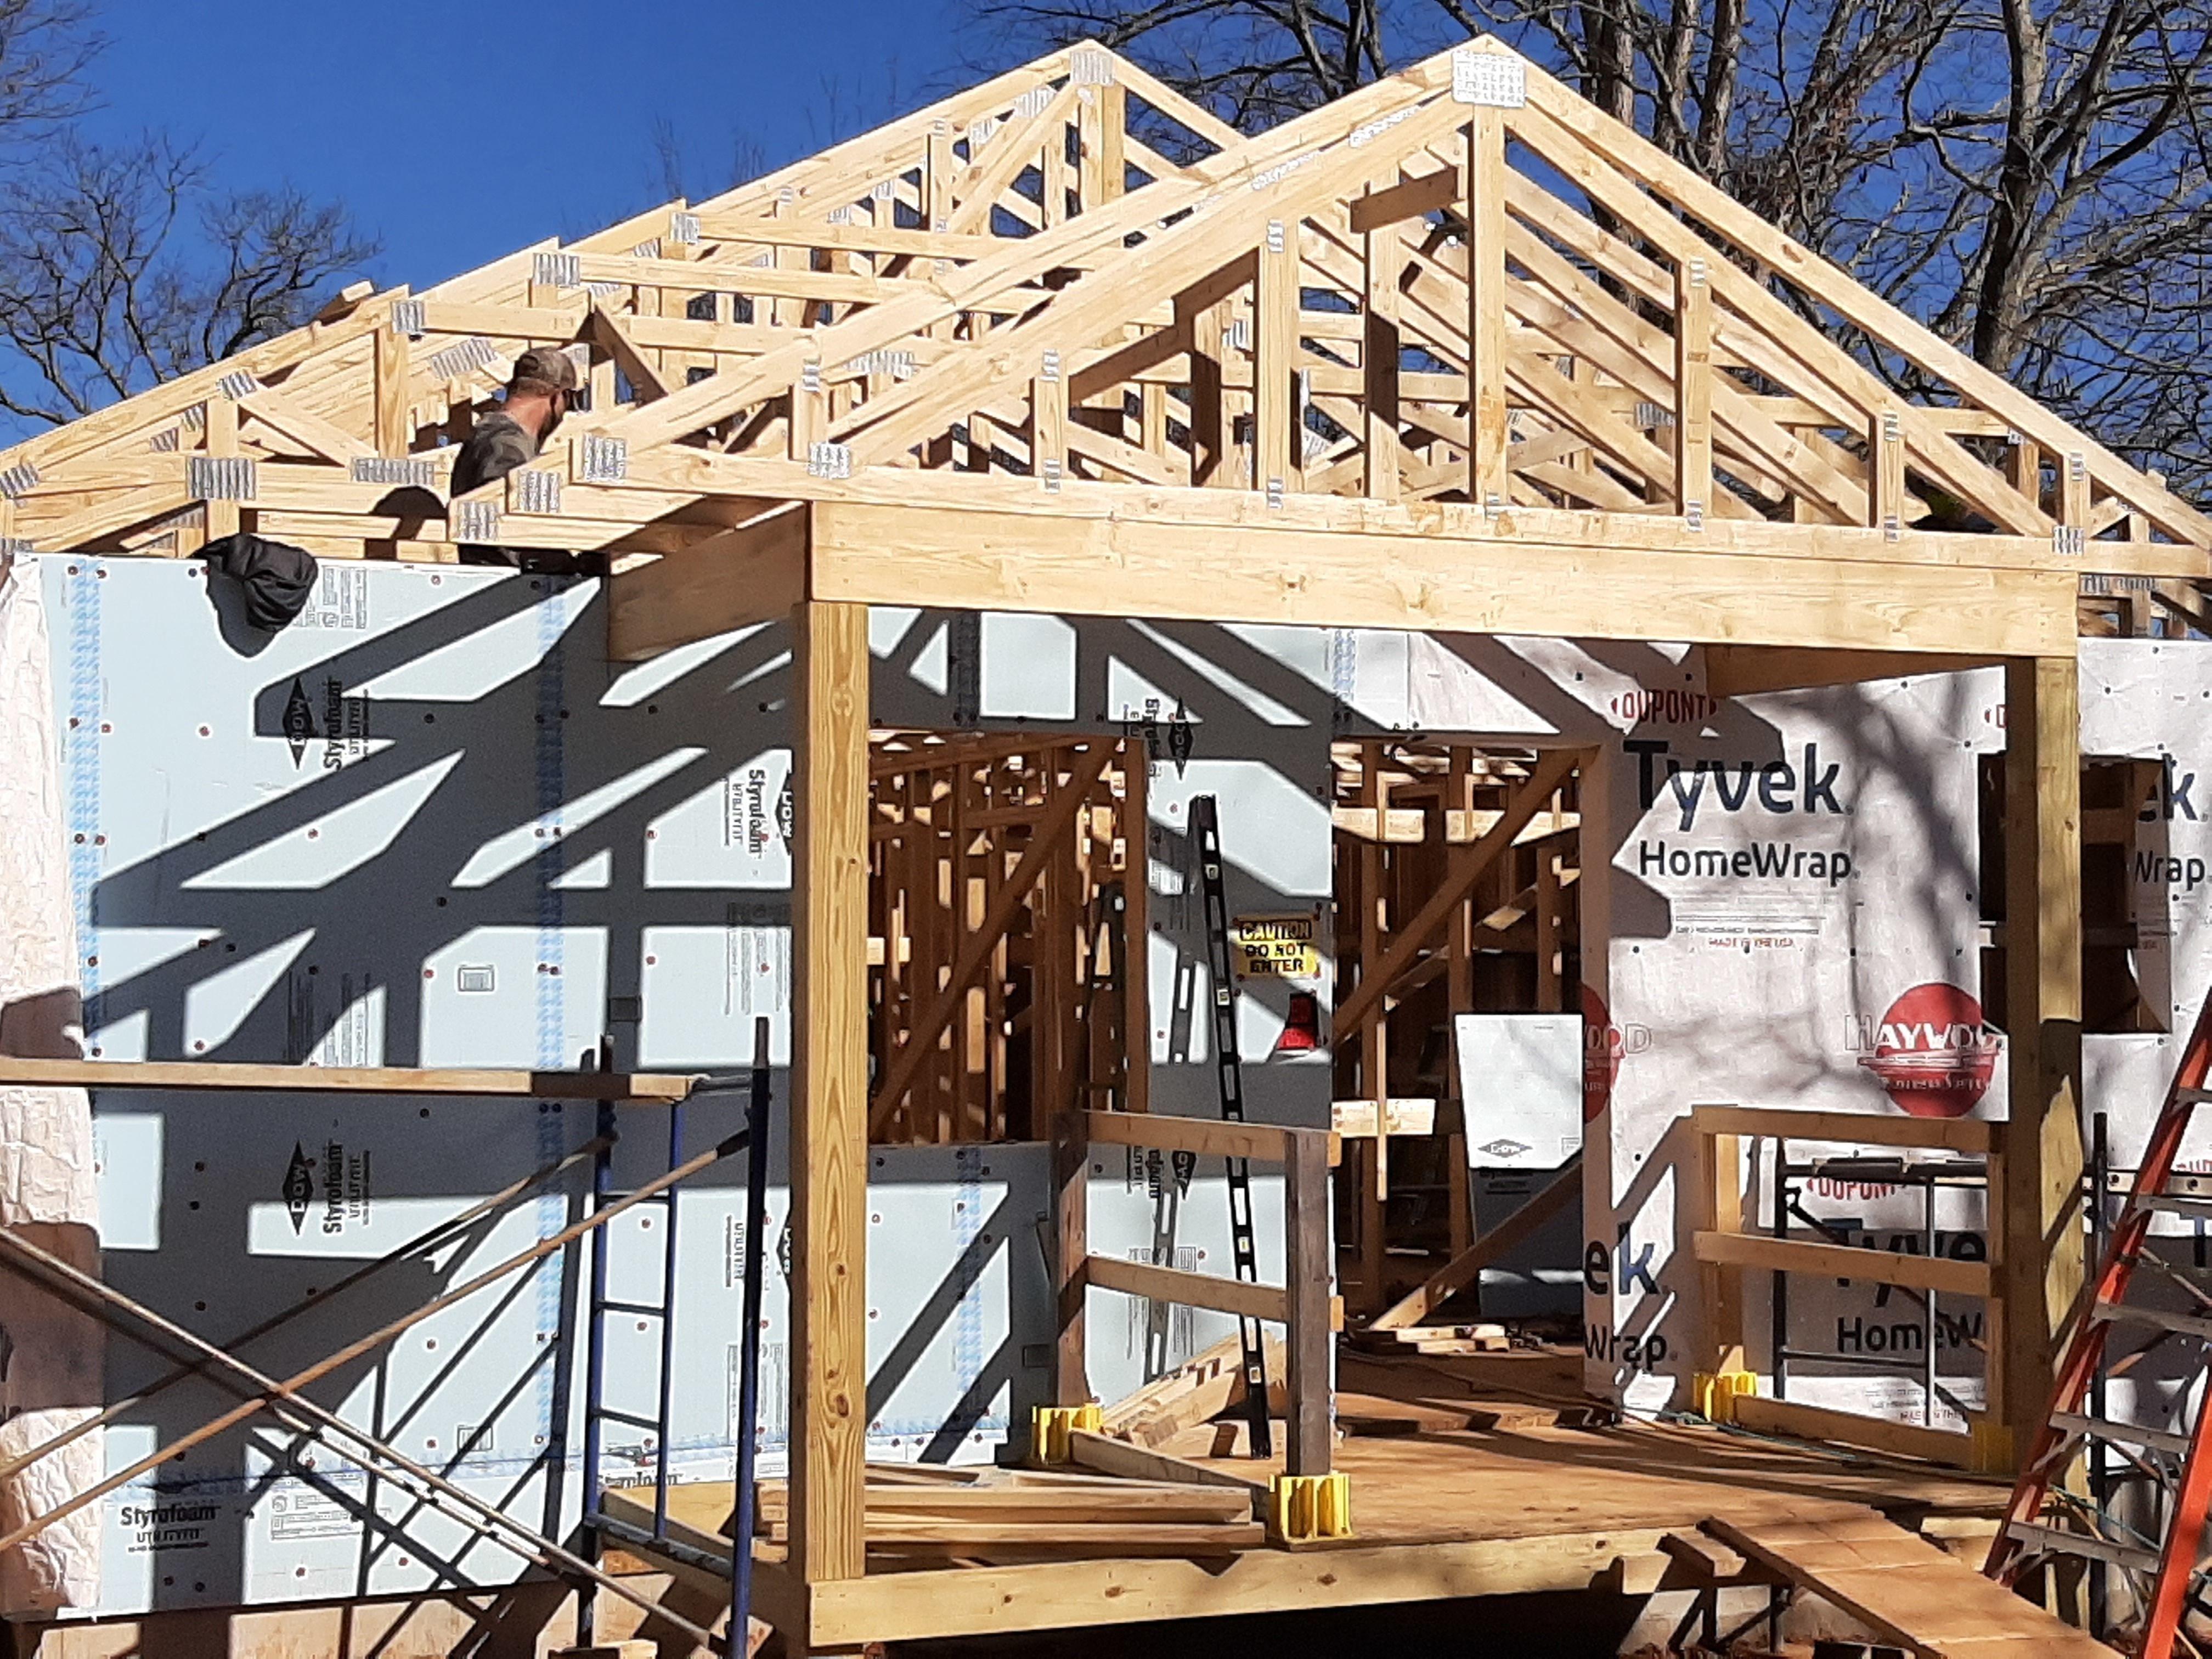 People in Need Grant awarded to Haywood Habitat